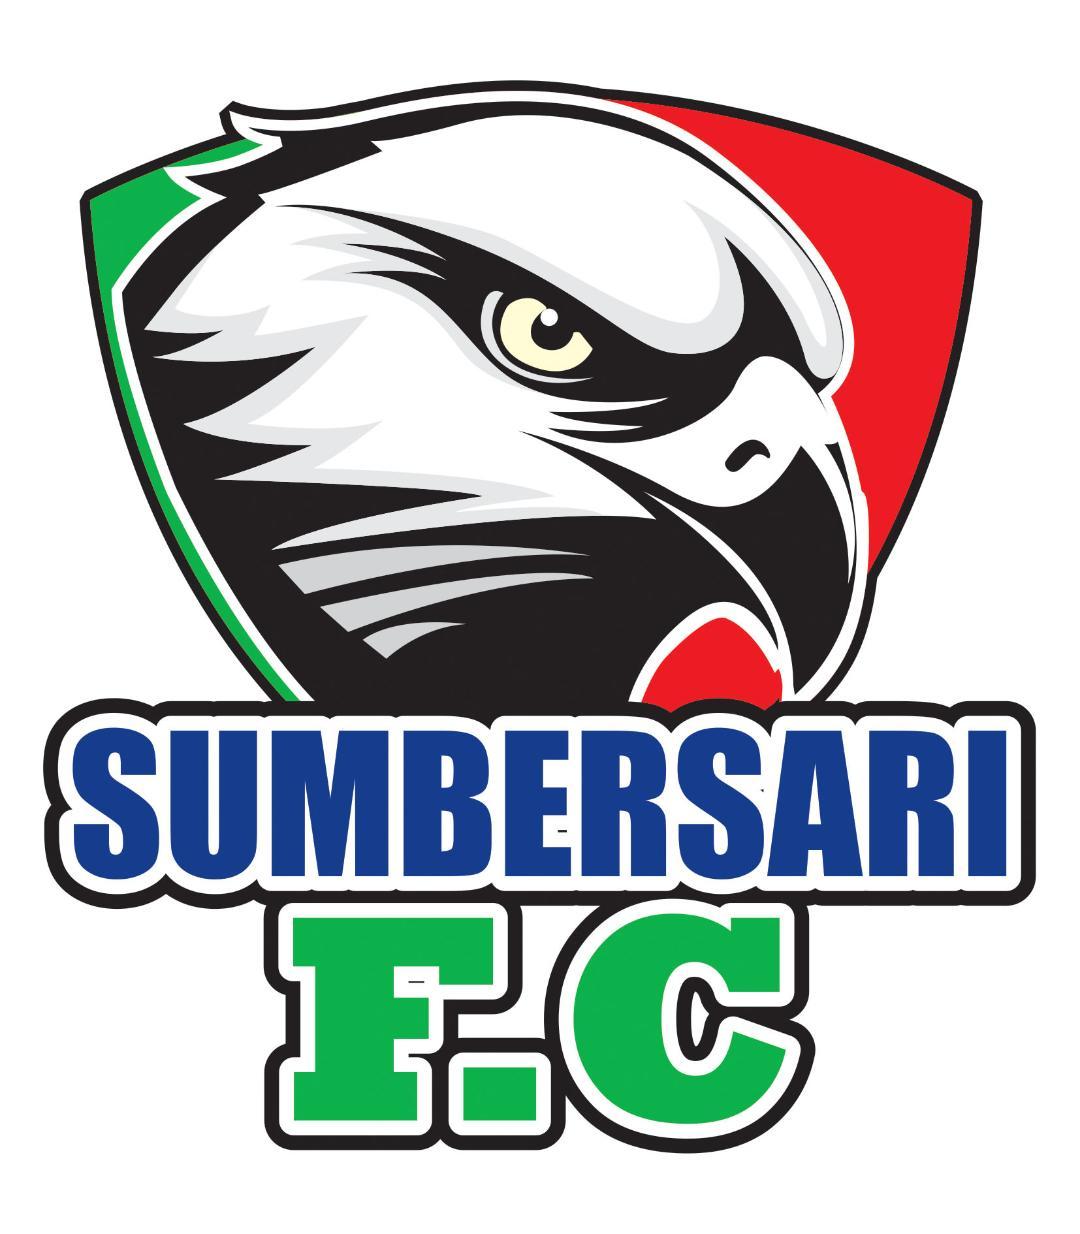 SUMBERSARI FC